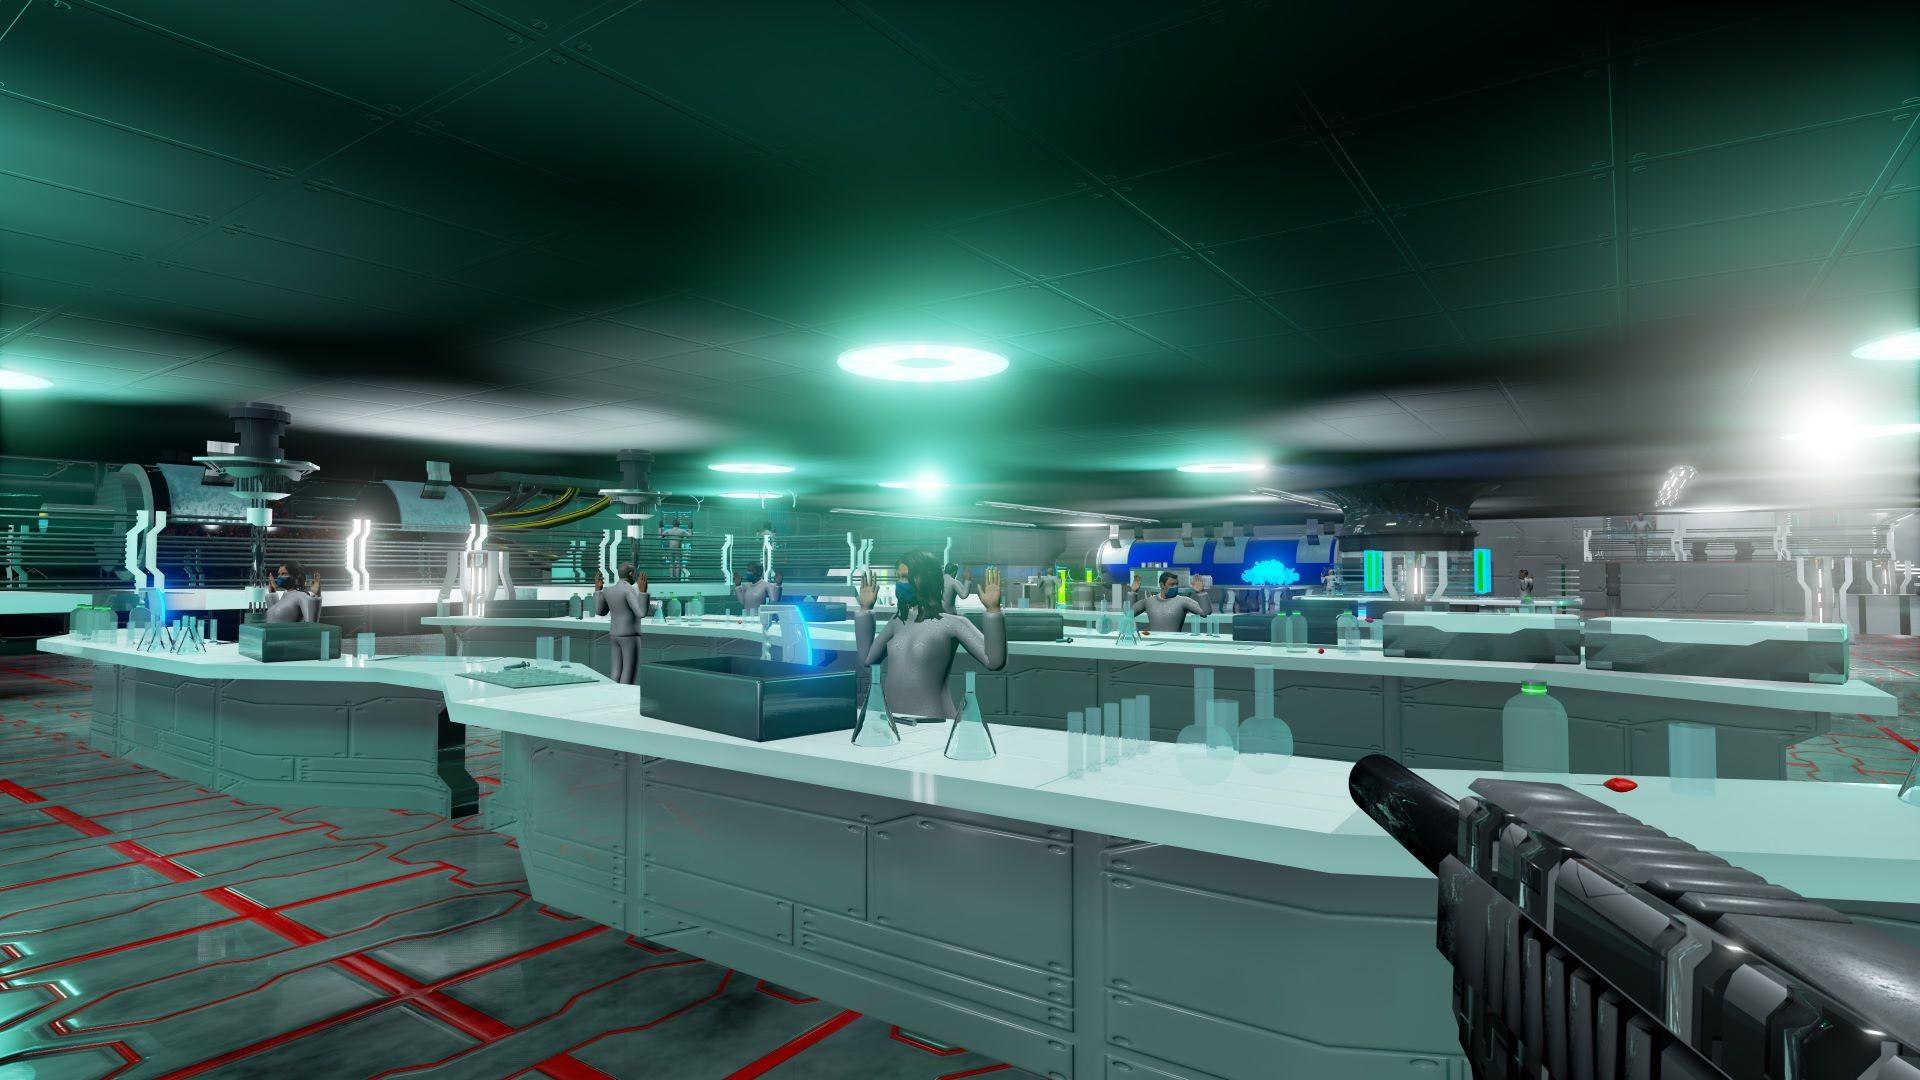 EXOTIUM - Episode 2 screenshot